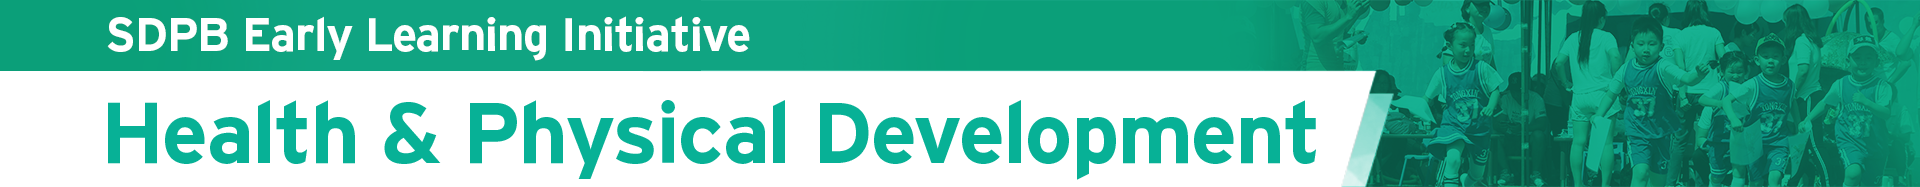 SDPB ELI Health & Physical Development